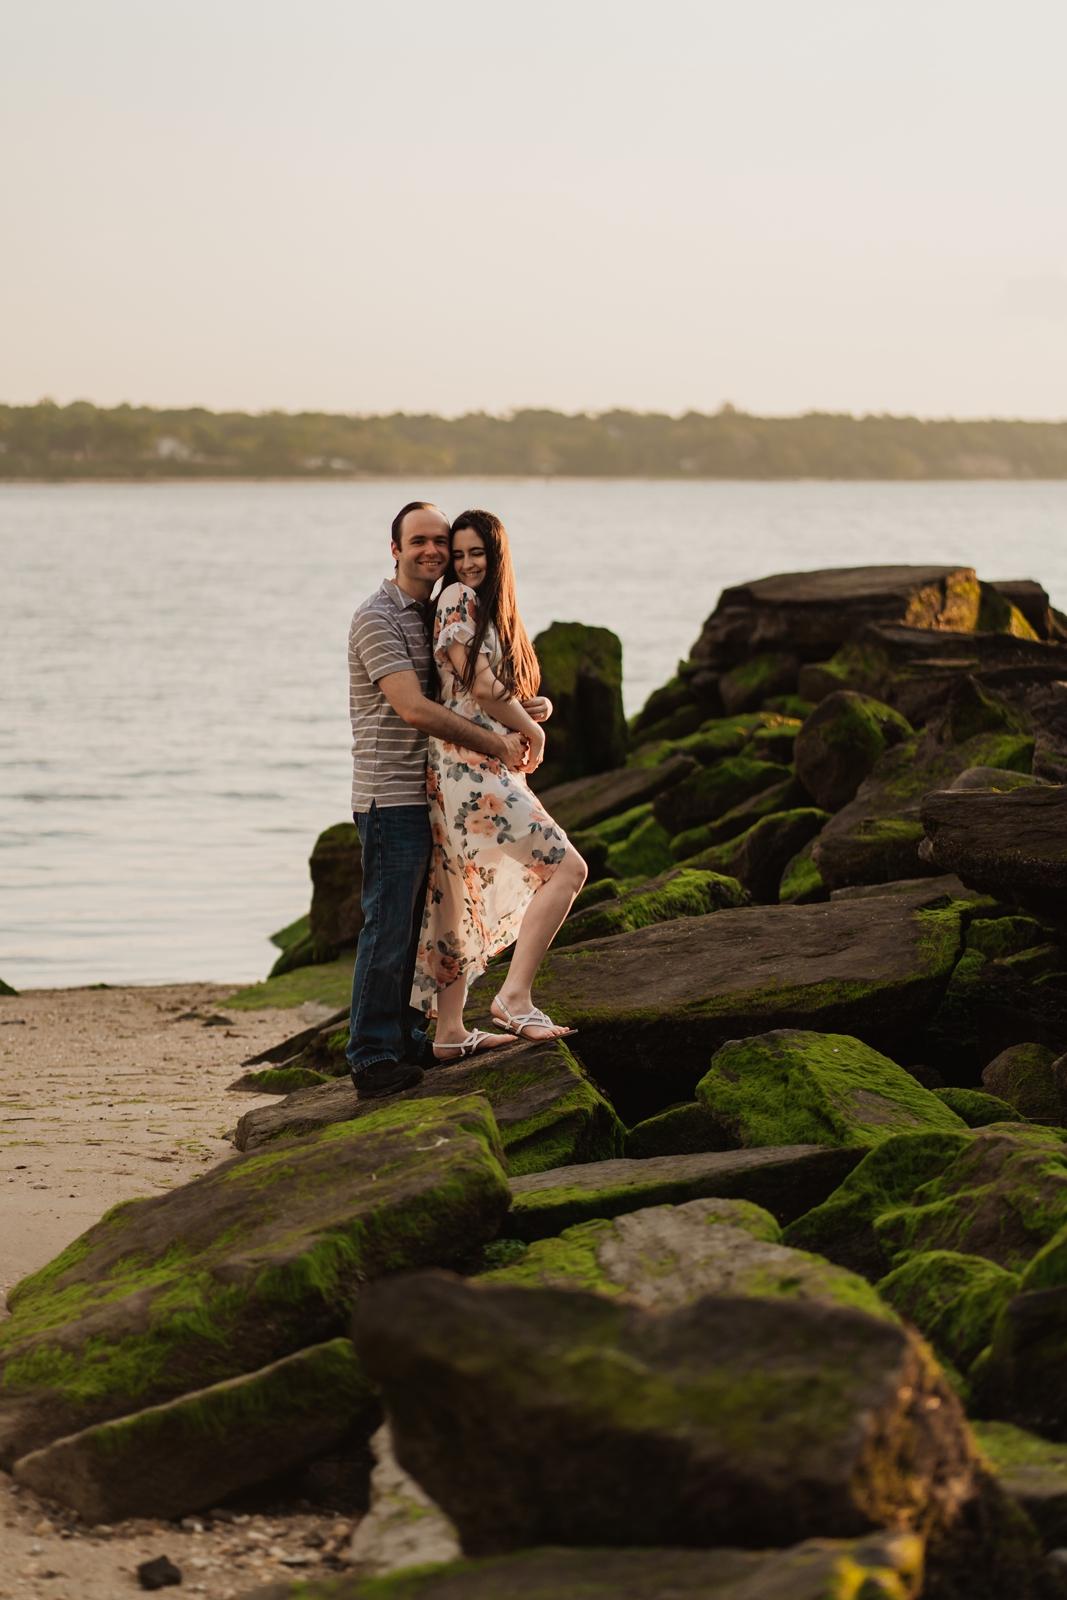 Ashley_James_Engagement_Morgan Park_Glen Cove_Sneak-May 20, 2019-12_blog.jpg